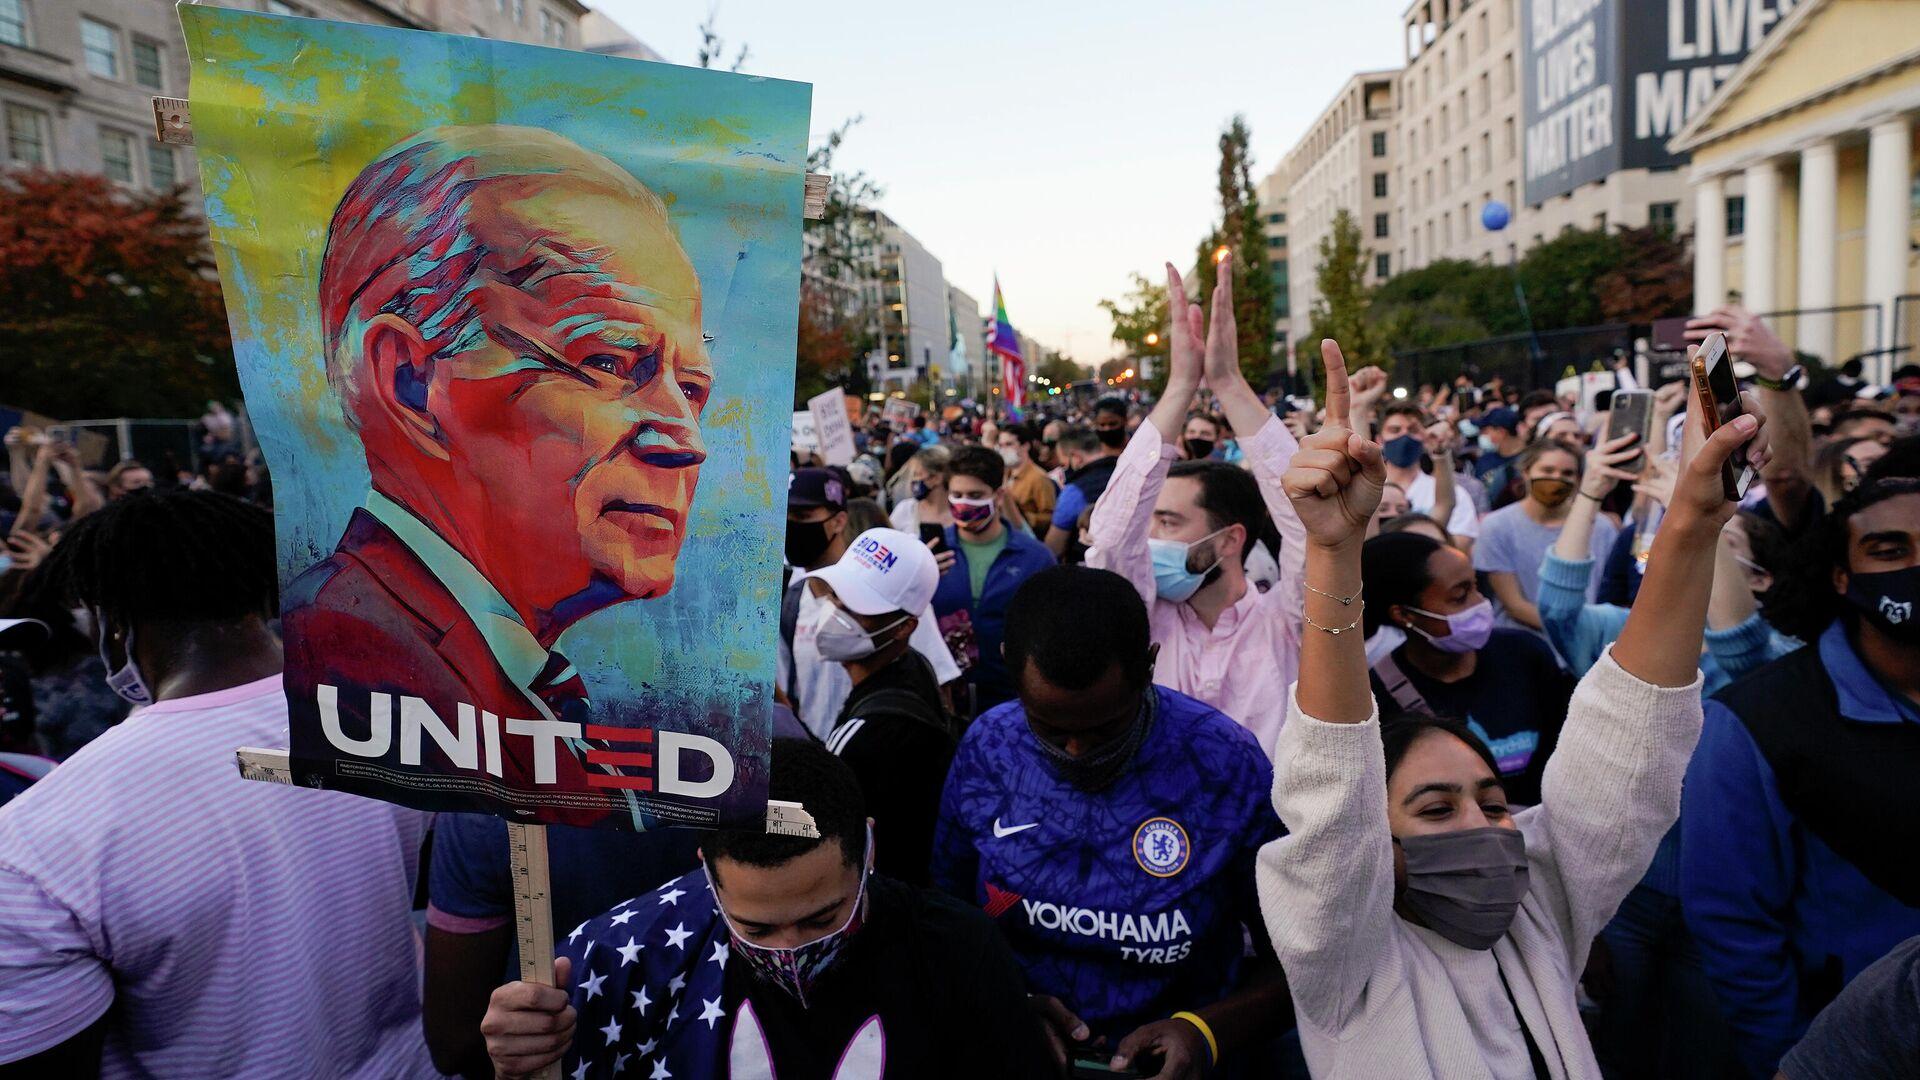 Люди на площади Black Lives Matter Plaza во время празднования победы избранного президента США Джо Байдена - РИА Новости, 1920, 16.02.2021